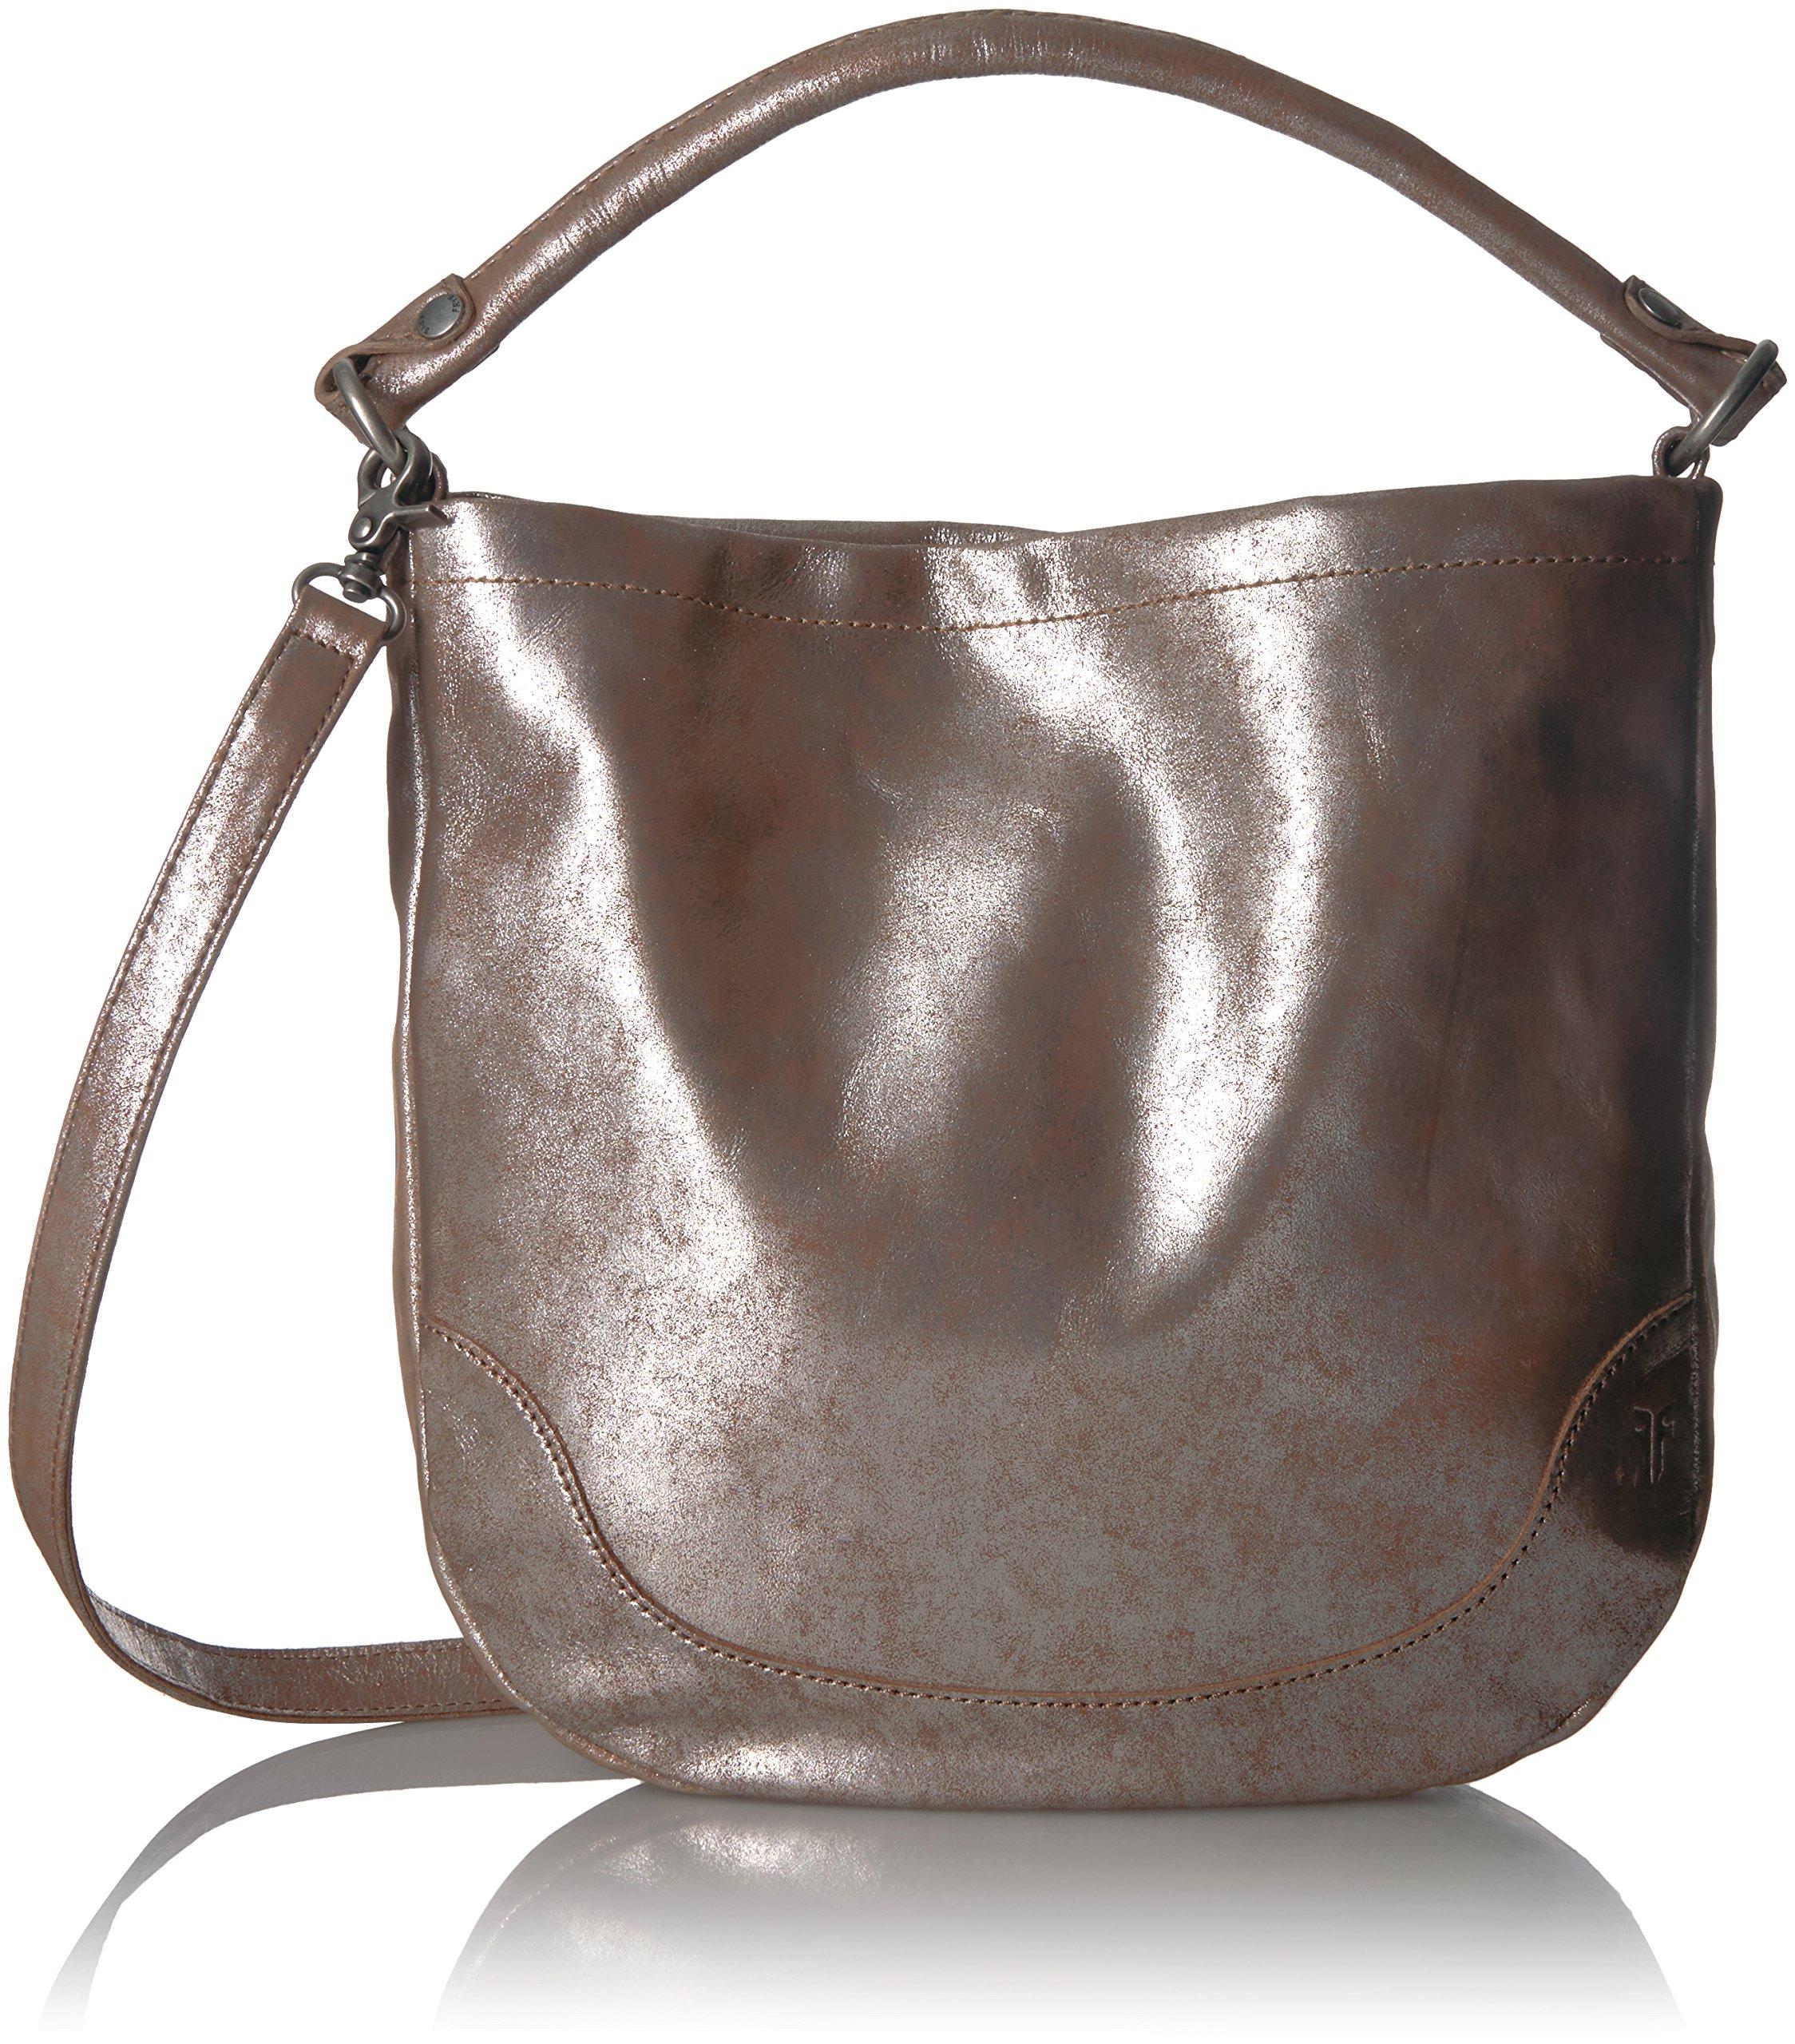 FRYE Melissa Hobo Leather Handbag, Silver/Multi